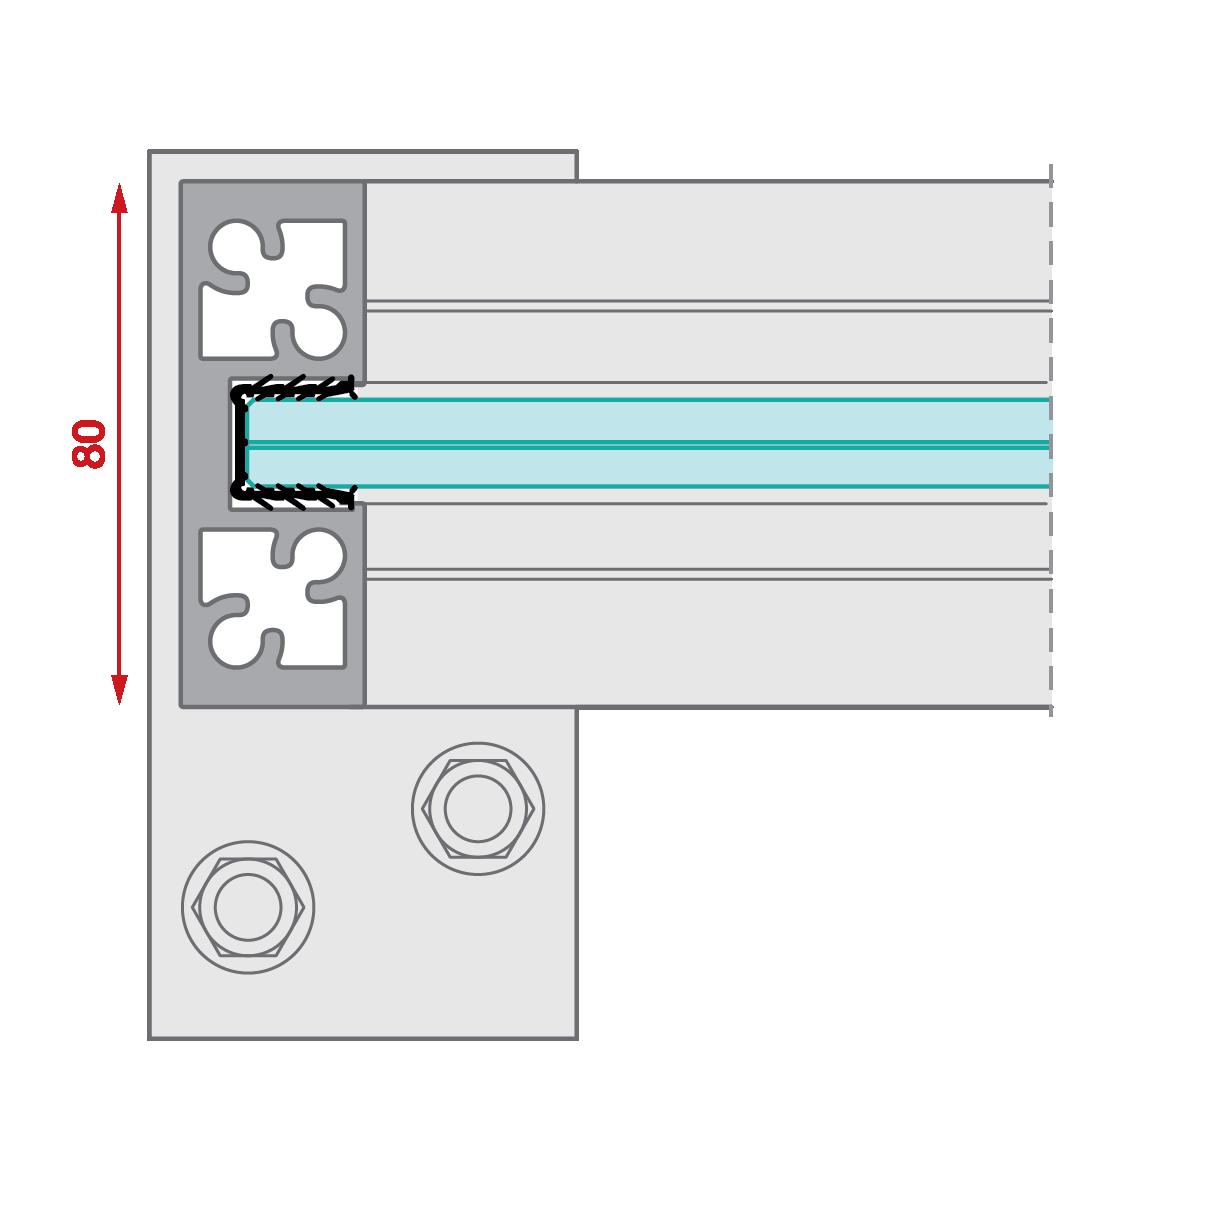 profilo olimpia 80_Artboard 2